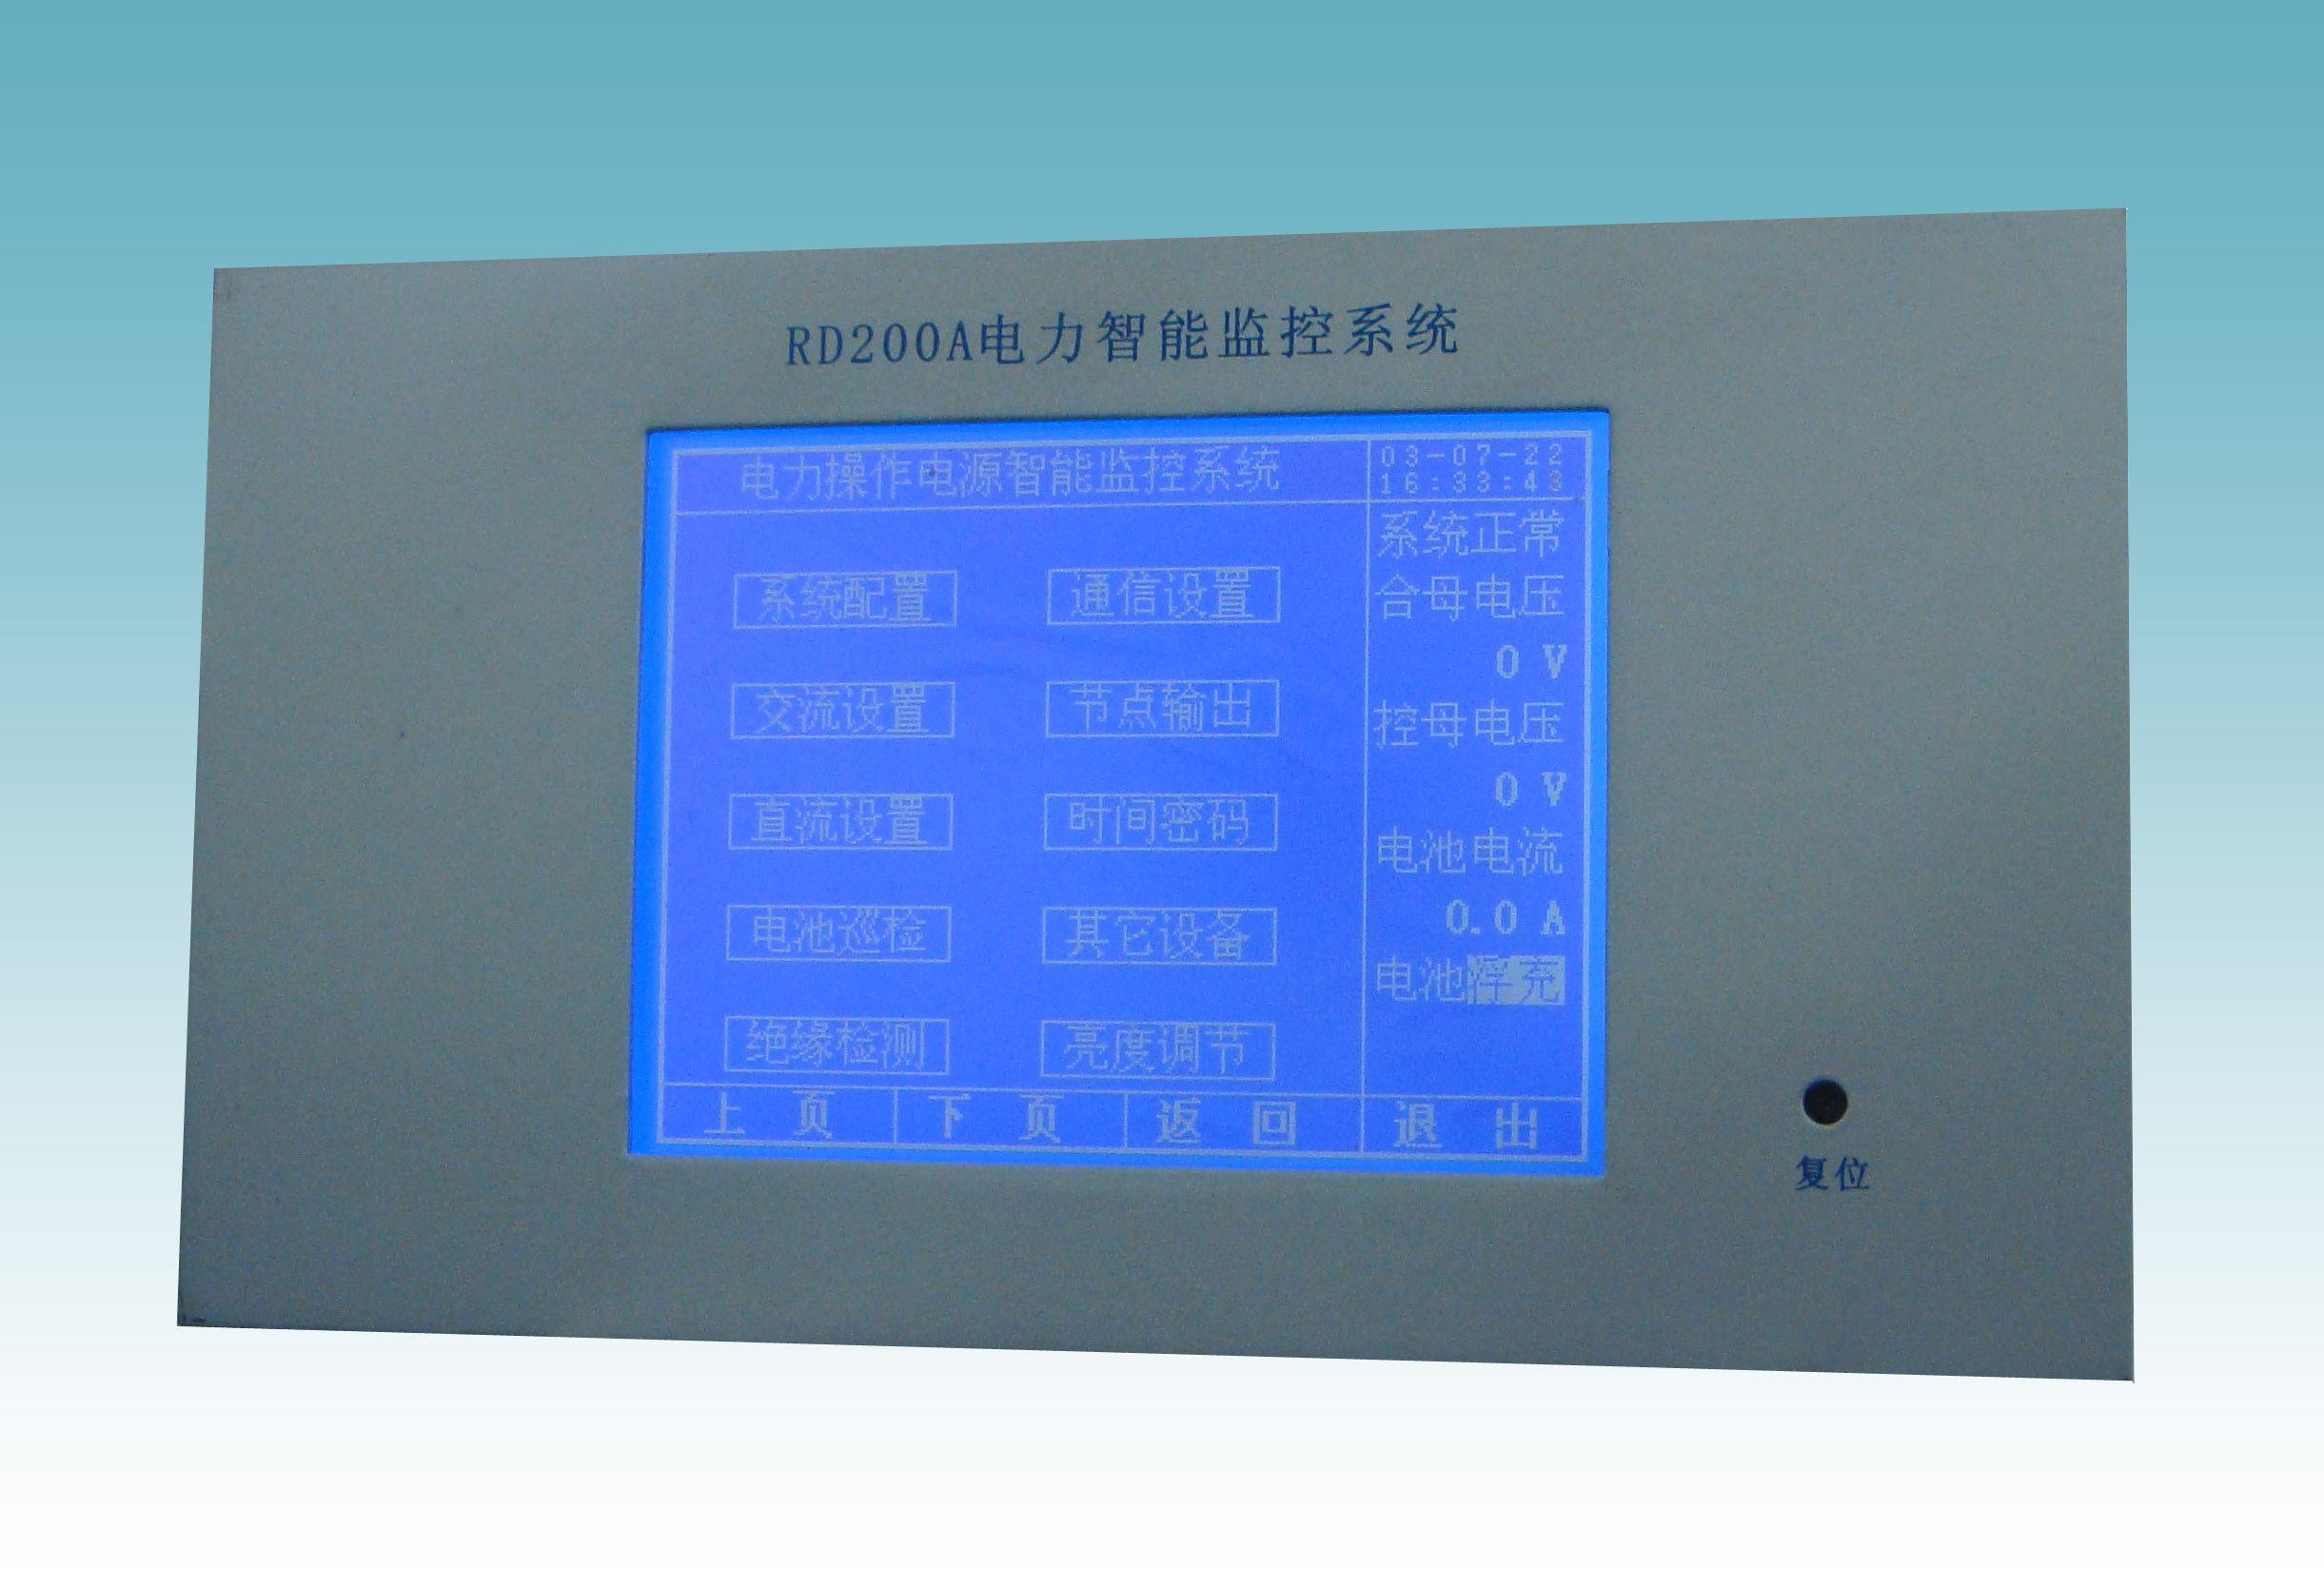 RD200A电力智能监控系统